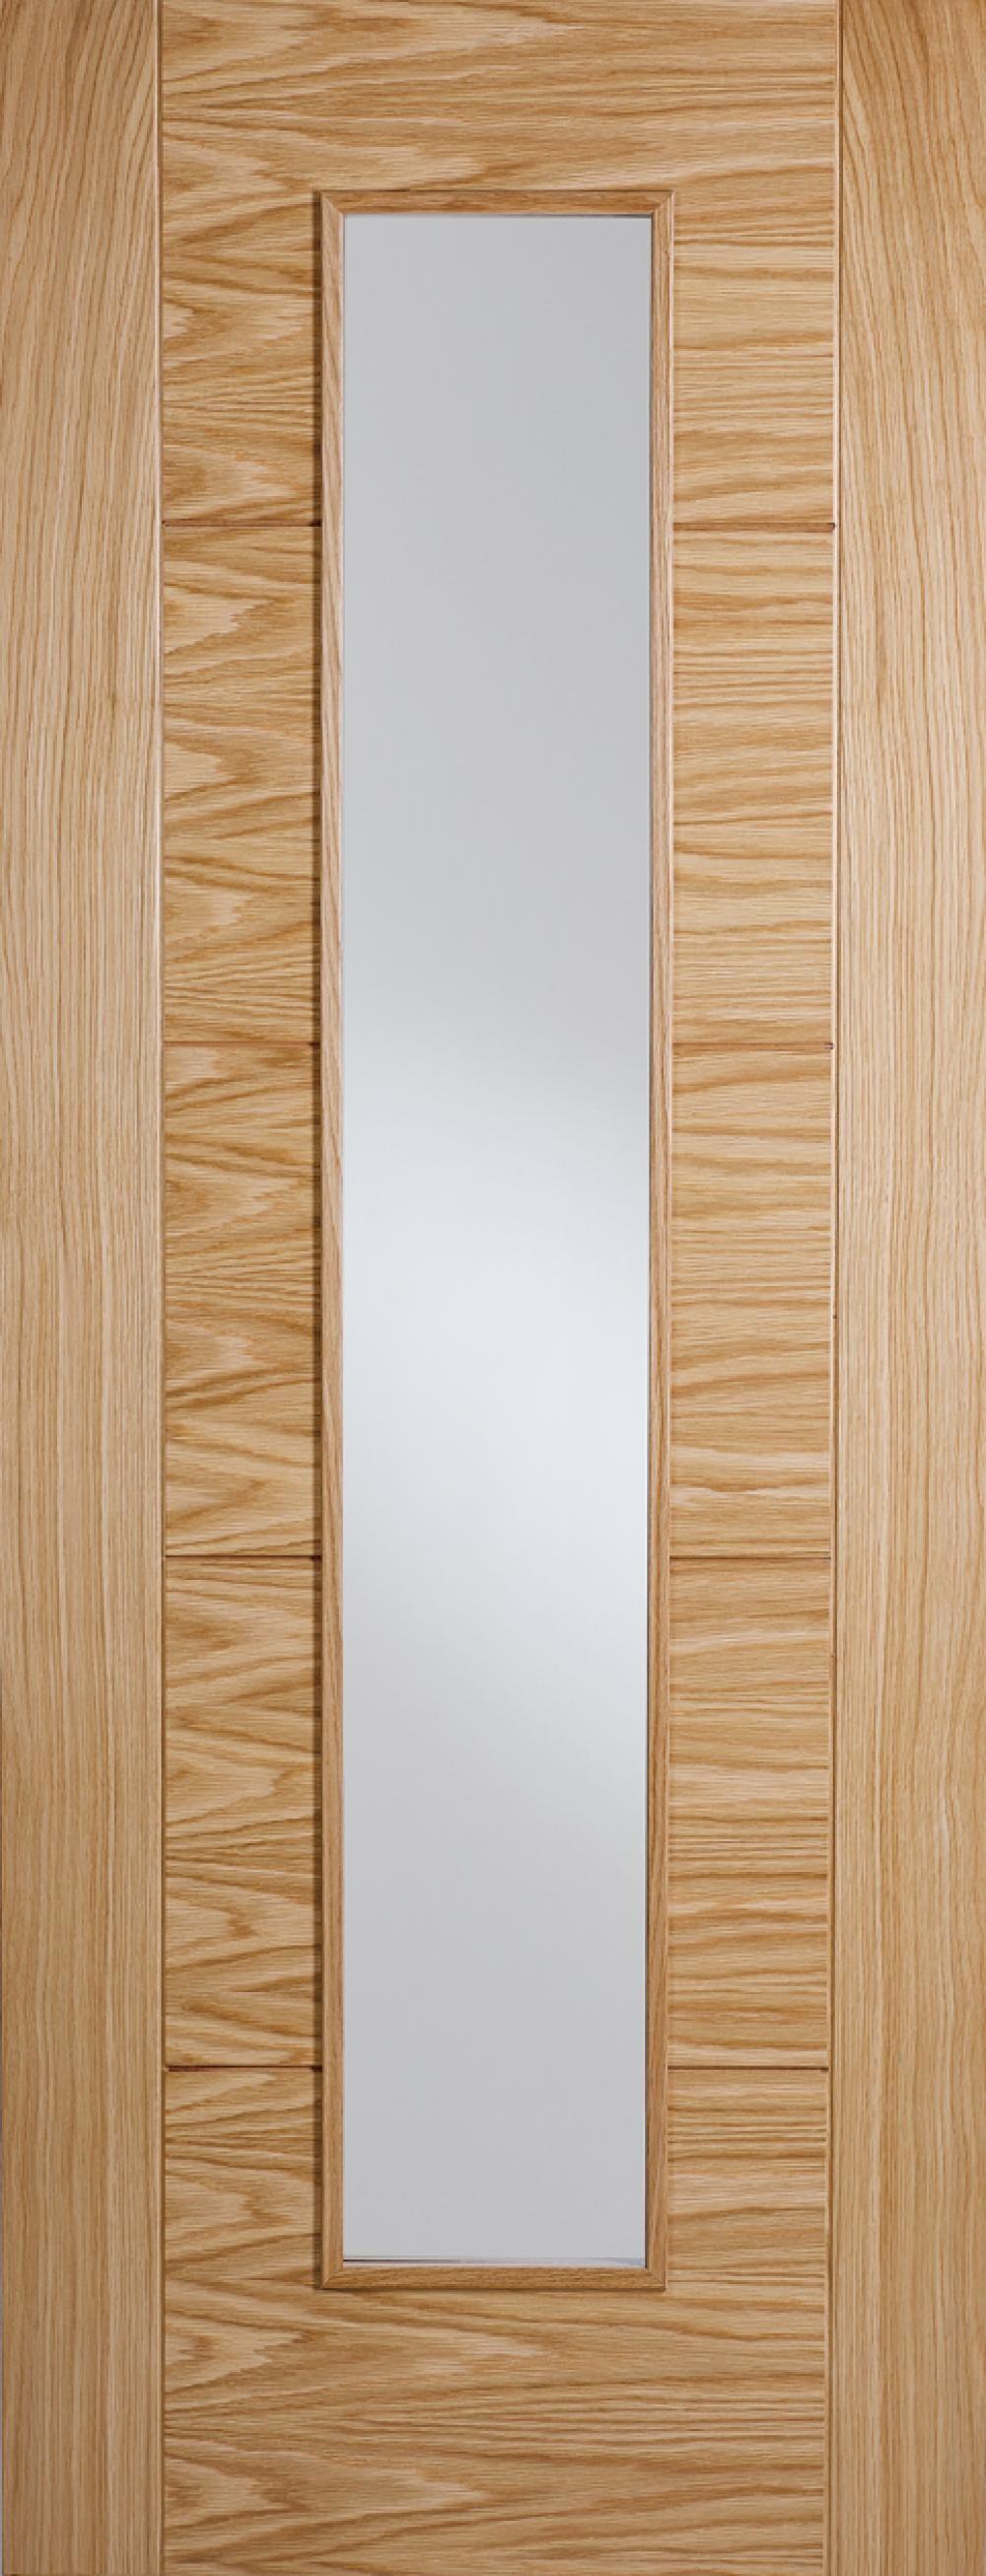 Vancouver Oak 1l - Prefinished  Image